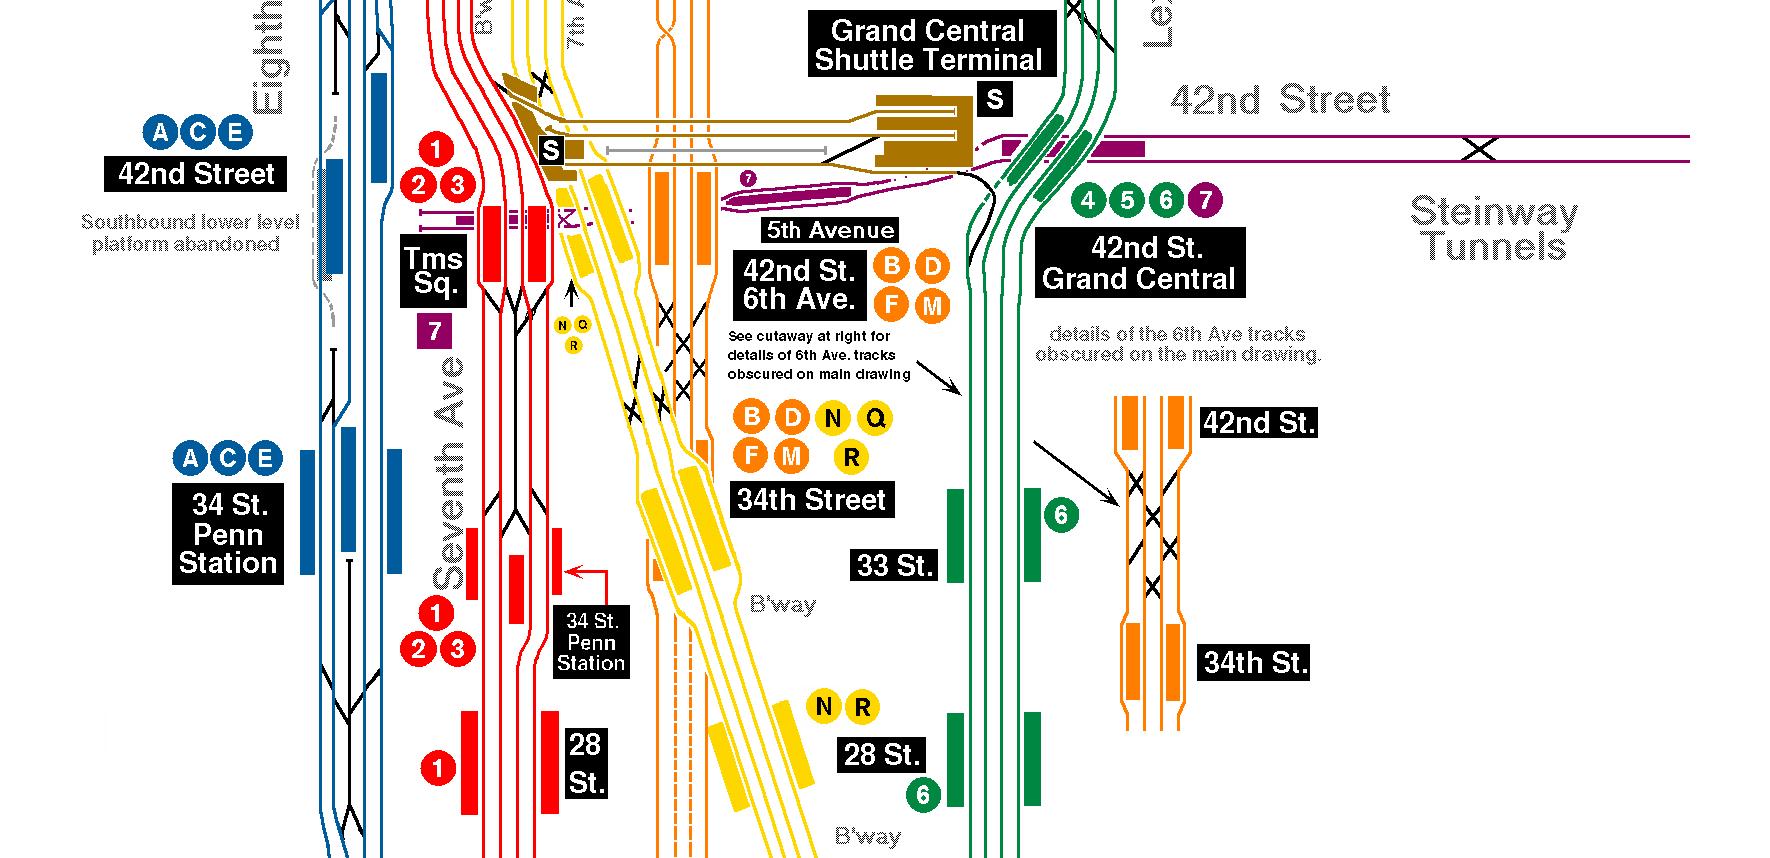 Nyc Subway Map A C E.Nyc Subway Entrances Carto Information Visualization